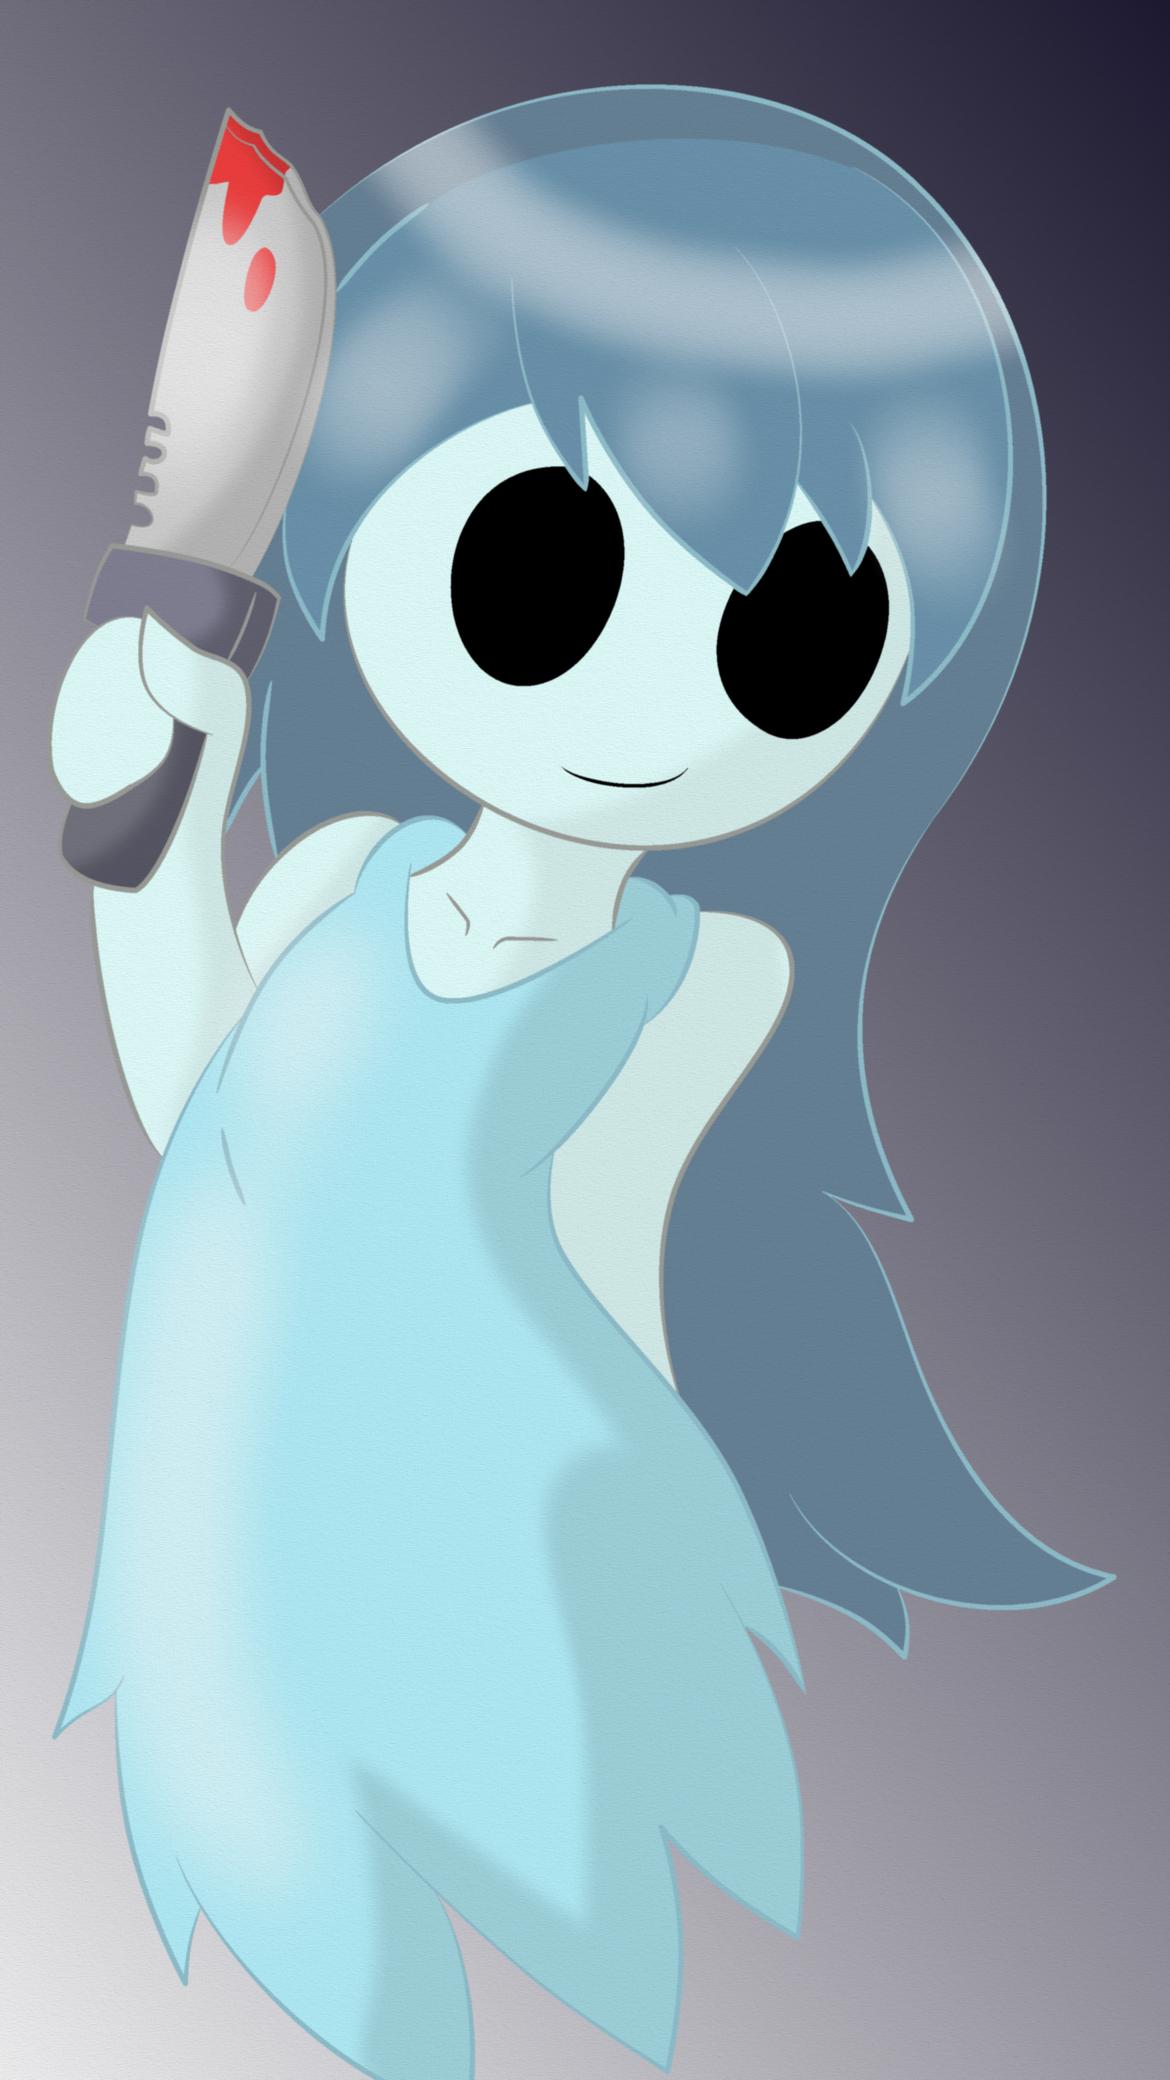 Spooky :D